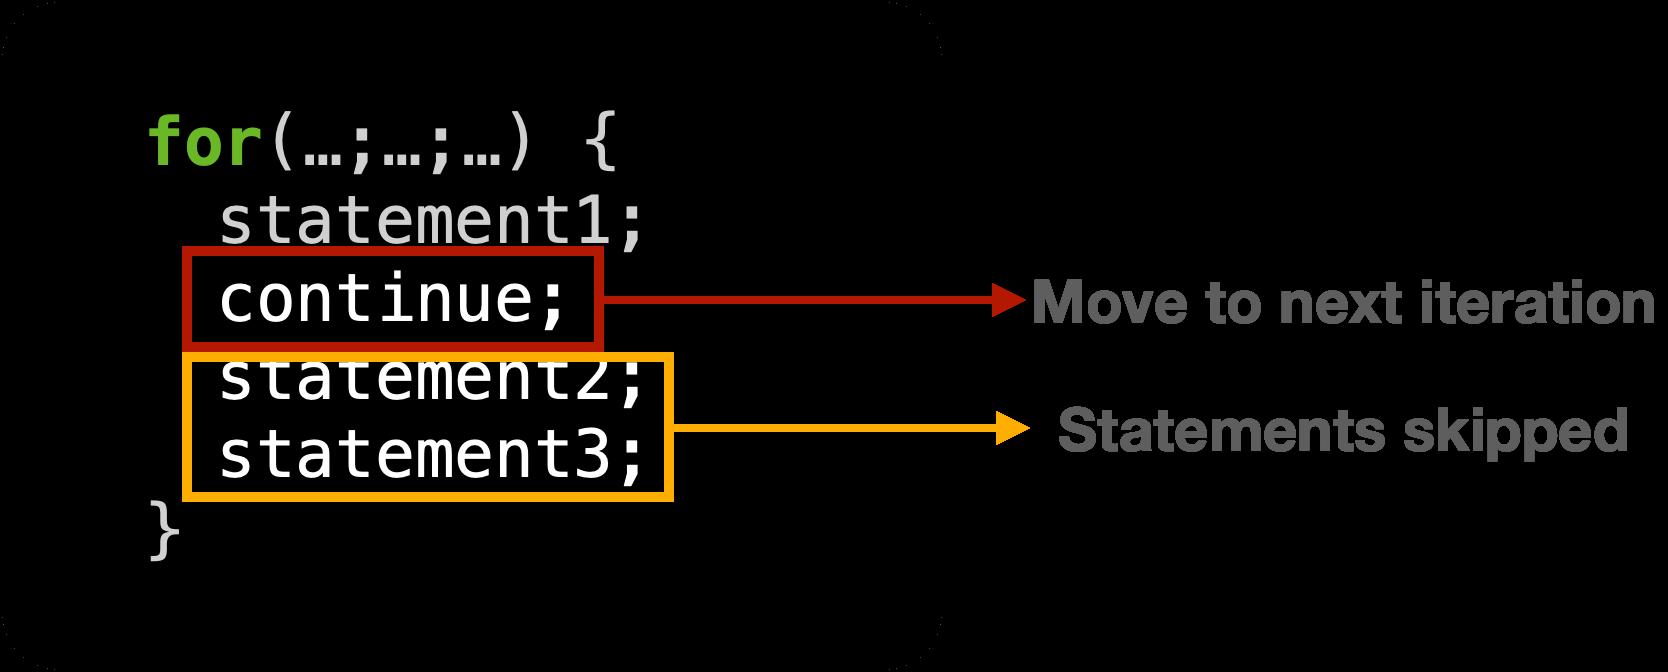 continue statement in Java